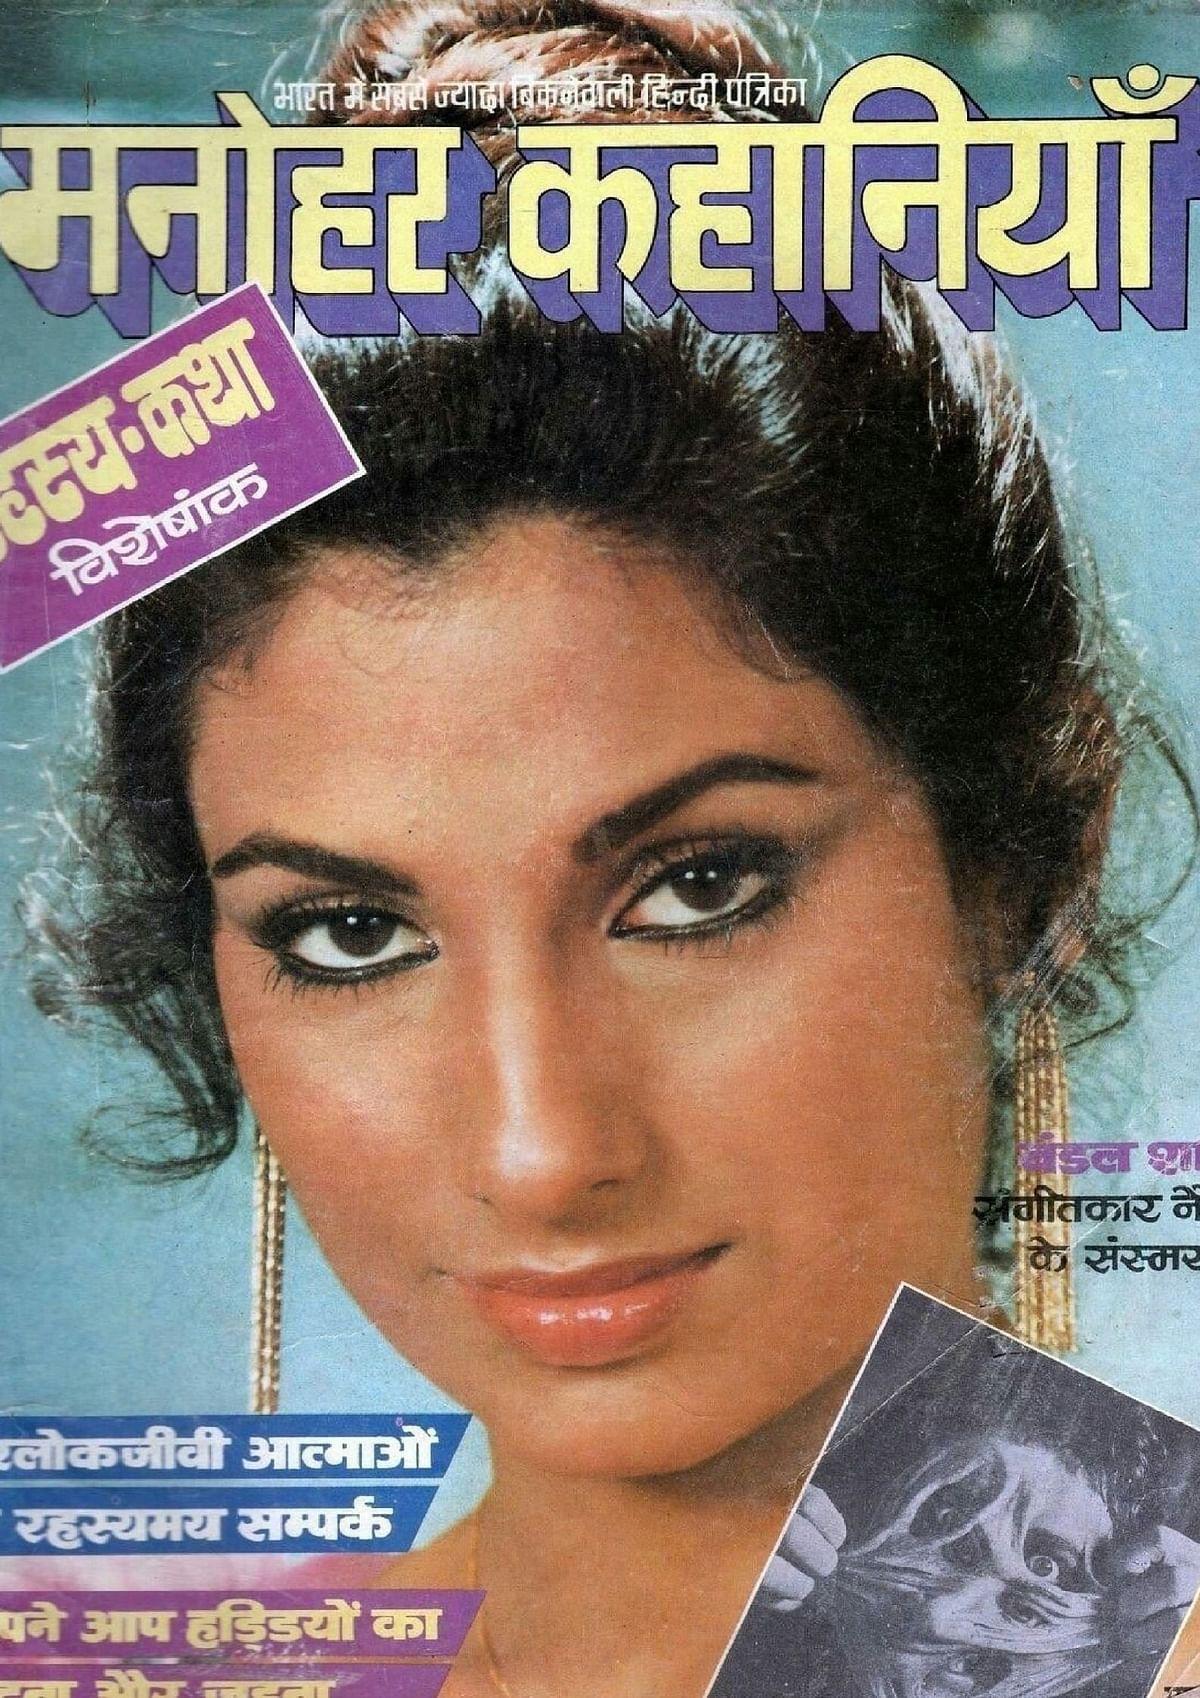 "<div class=""paragraphs""><p>The magazine <em>Manohar Kahaniyaan</em></p></div>"